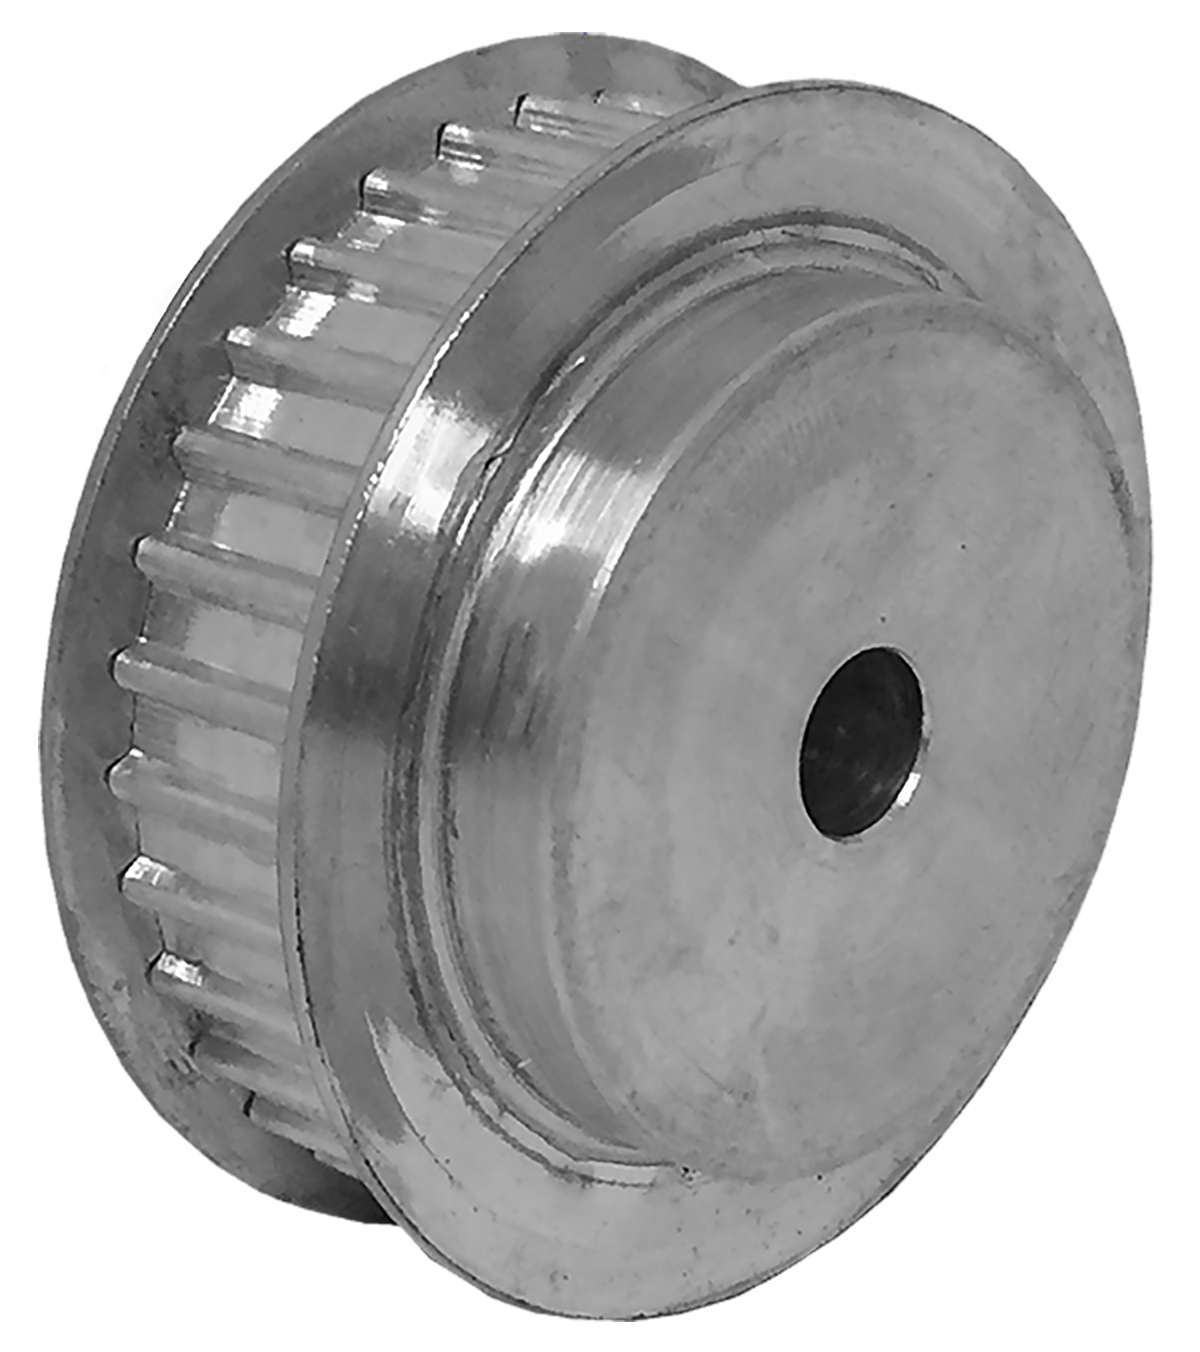 21AT5/32-2 - Aluminum Metric Pulleys